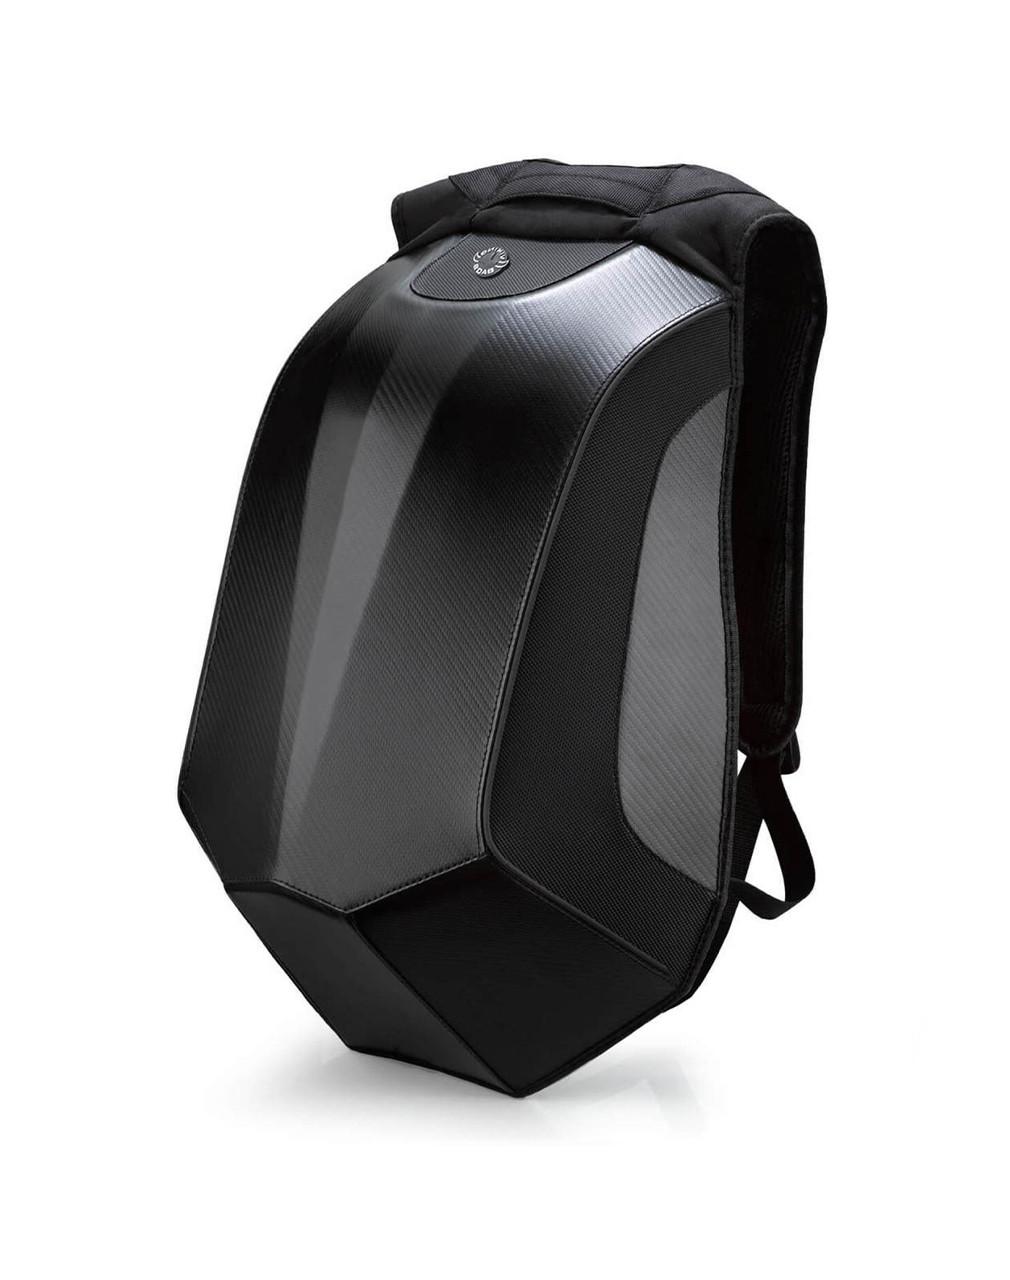 VikingBags Velocity Large Black Expandable Suzuki Motorcycle Backpack Main Bag View